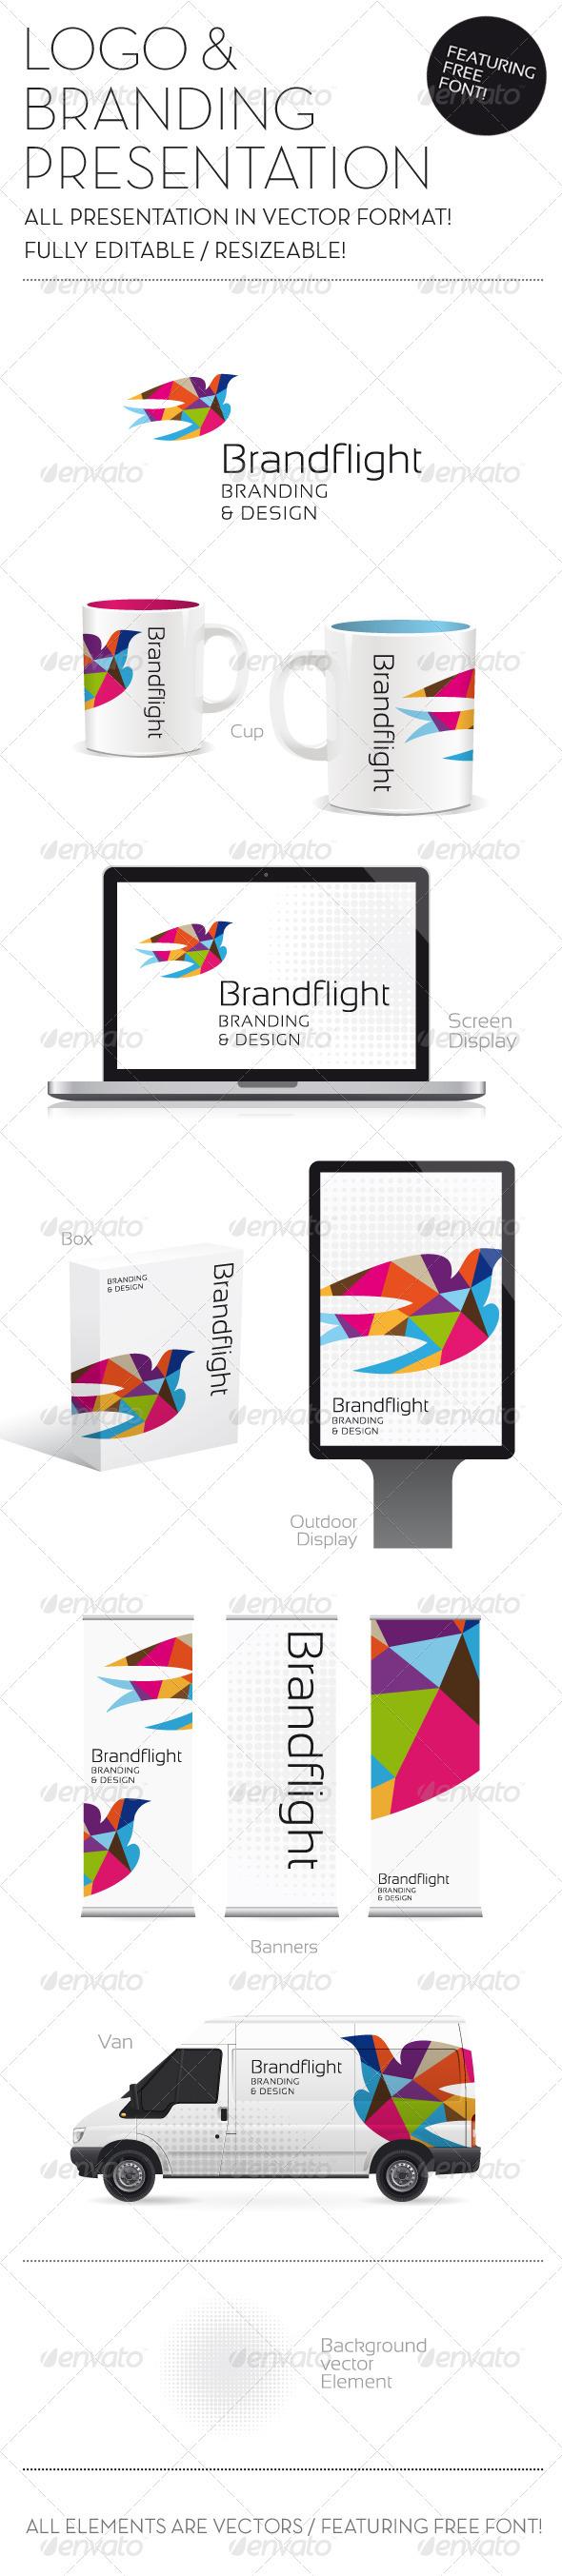 Logo & Branding Presentation